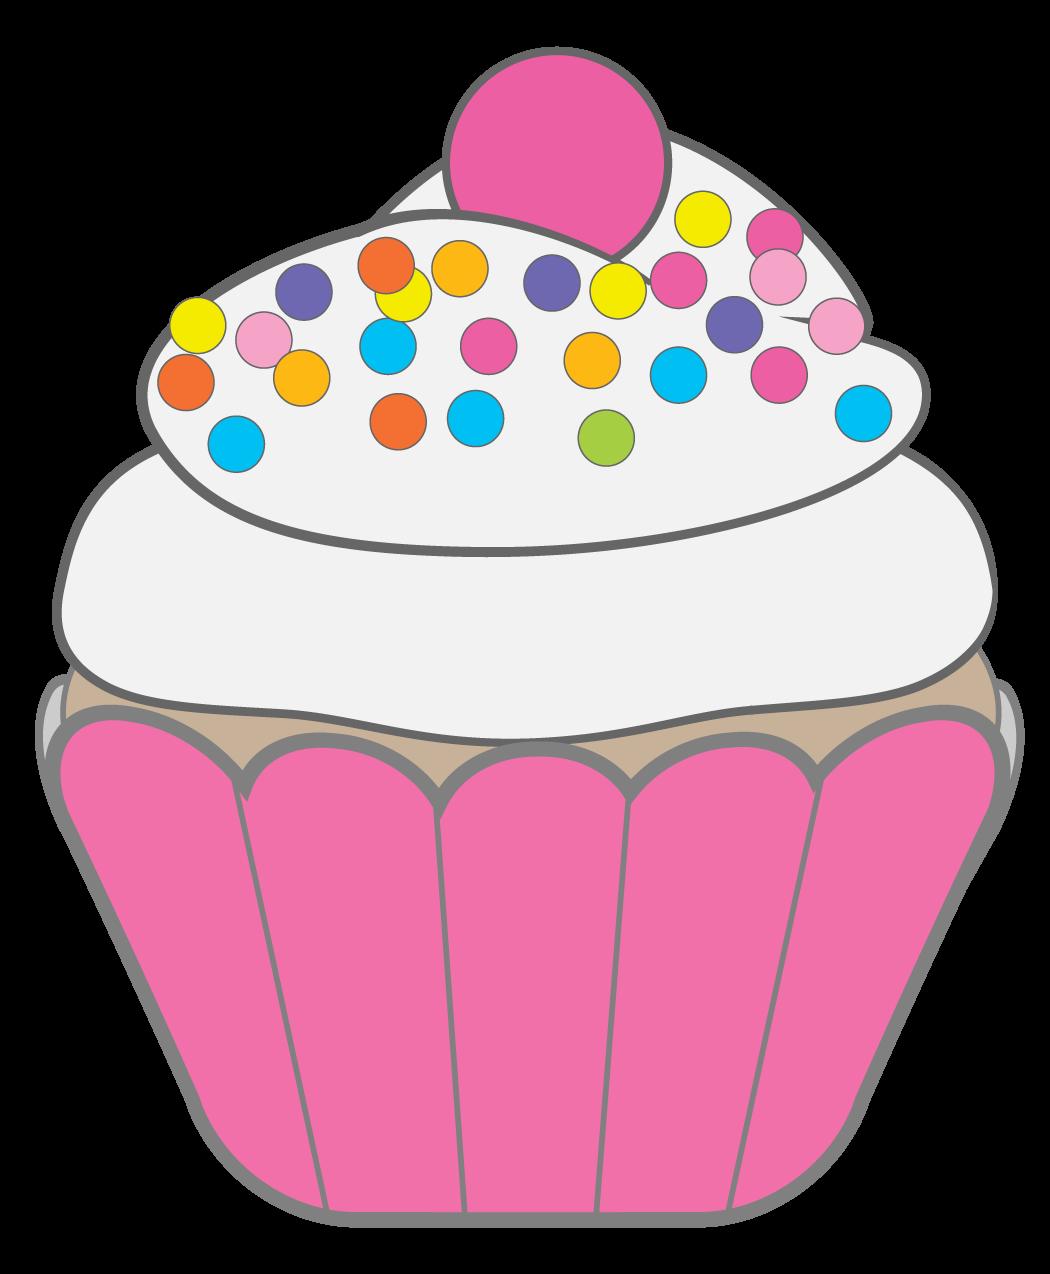 Muffin Clipart-muffin clipart-8